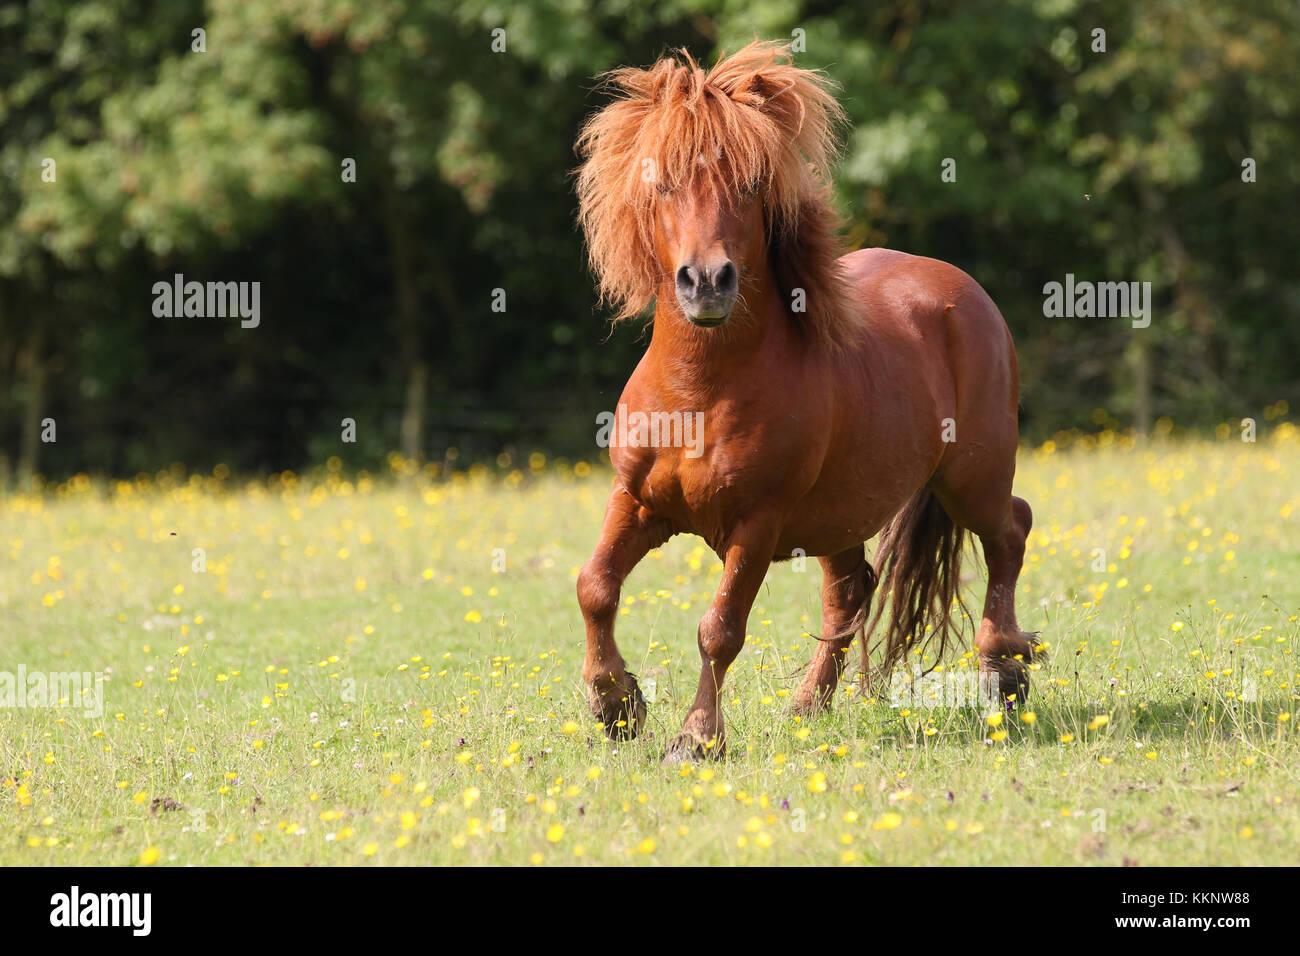 Shetland Stallion - Stock Image